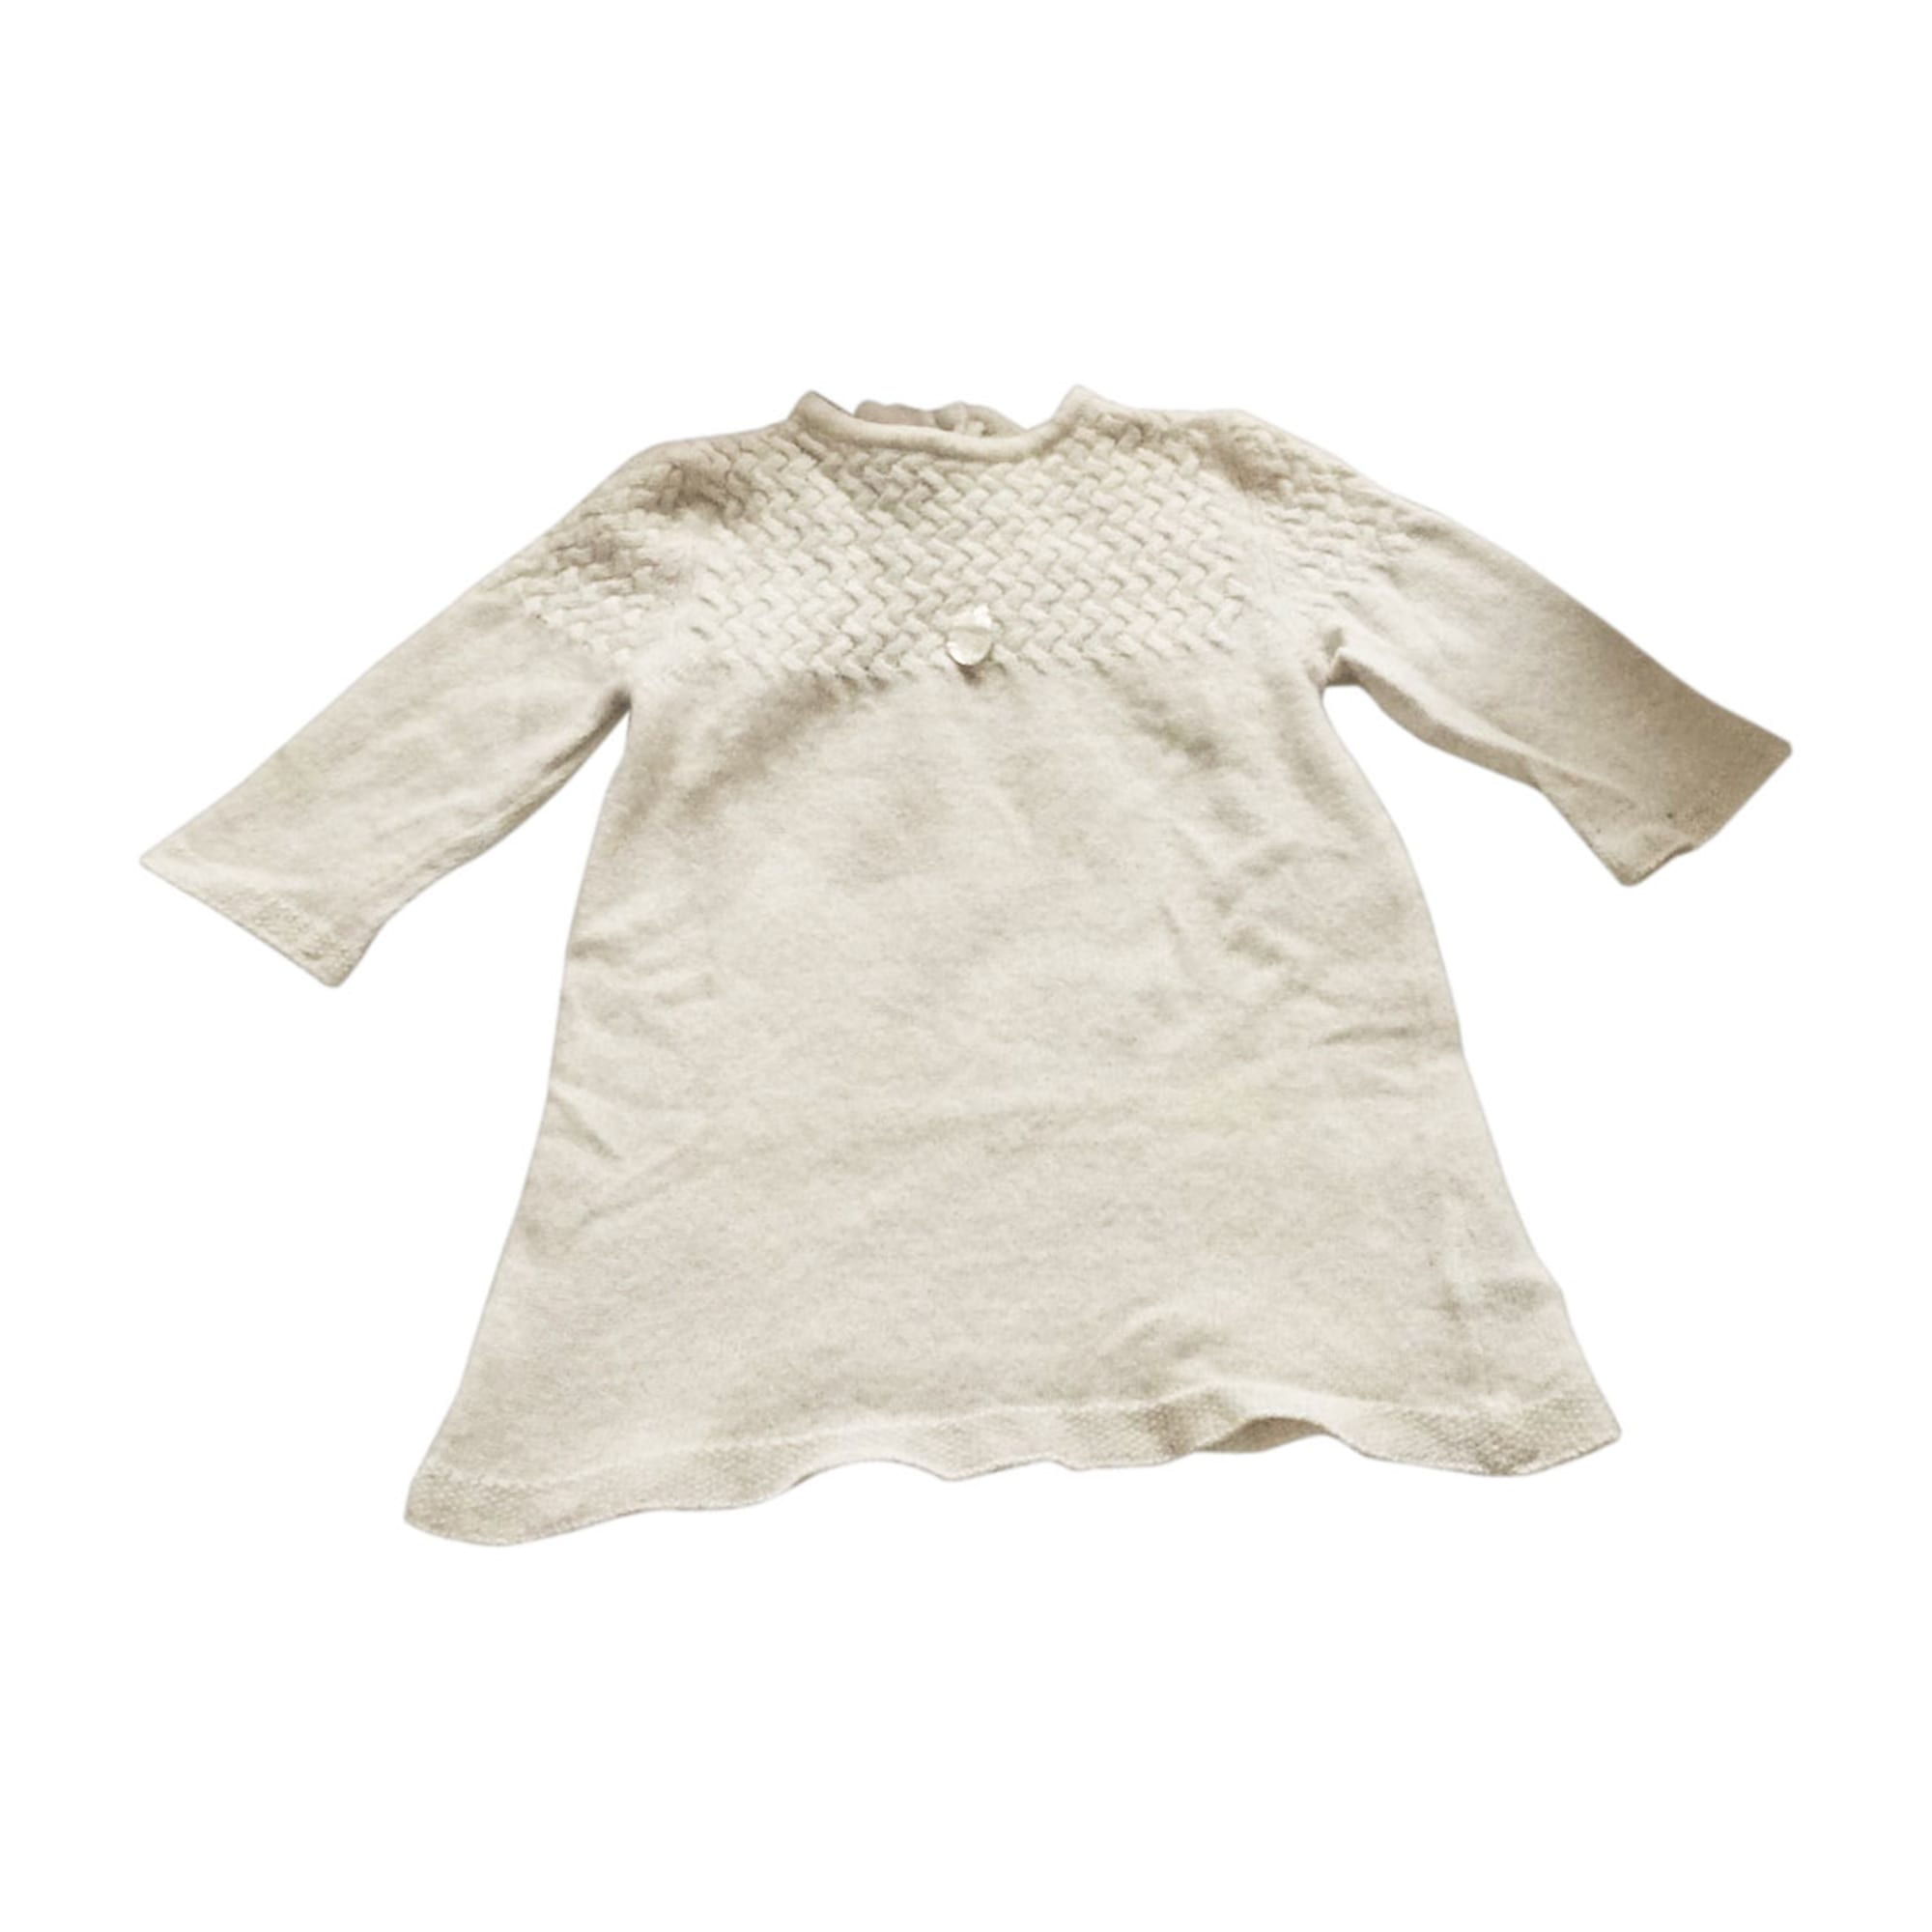 Dress BABY DIOR White, off-white, ecru